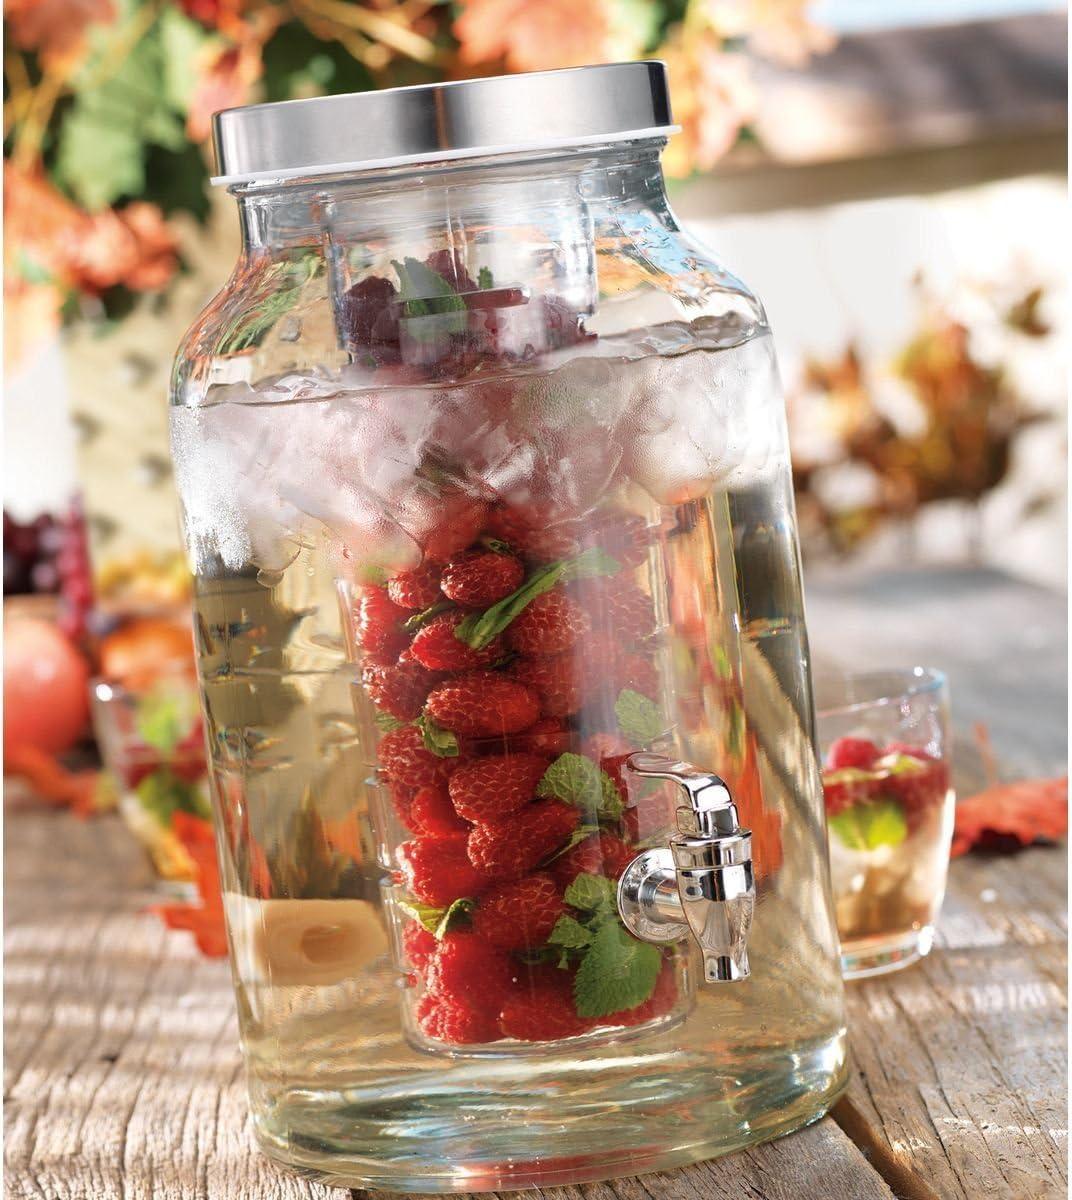 Home Essentials & Beyond Del Sol 1.5 gallon Infuser Beverage Dispenser, Clear